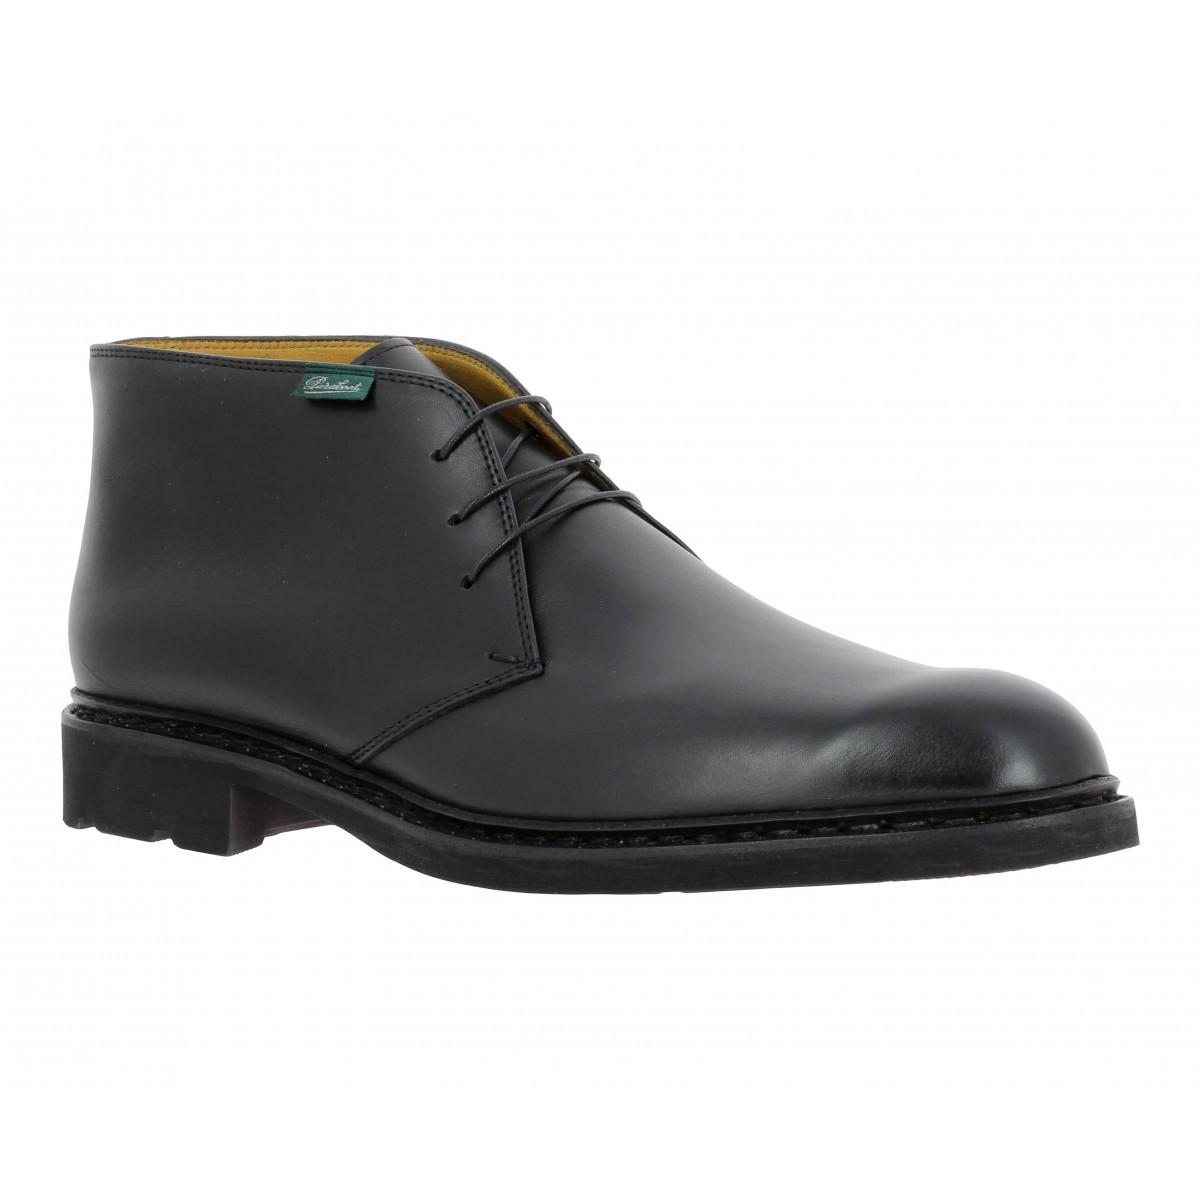 chaussures lully Paraboot homme noir Fanny cuir X7xqc0BU